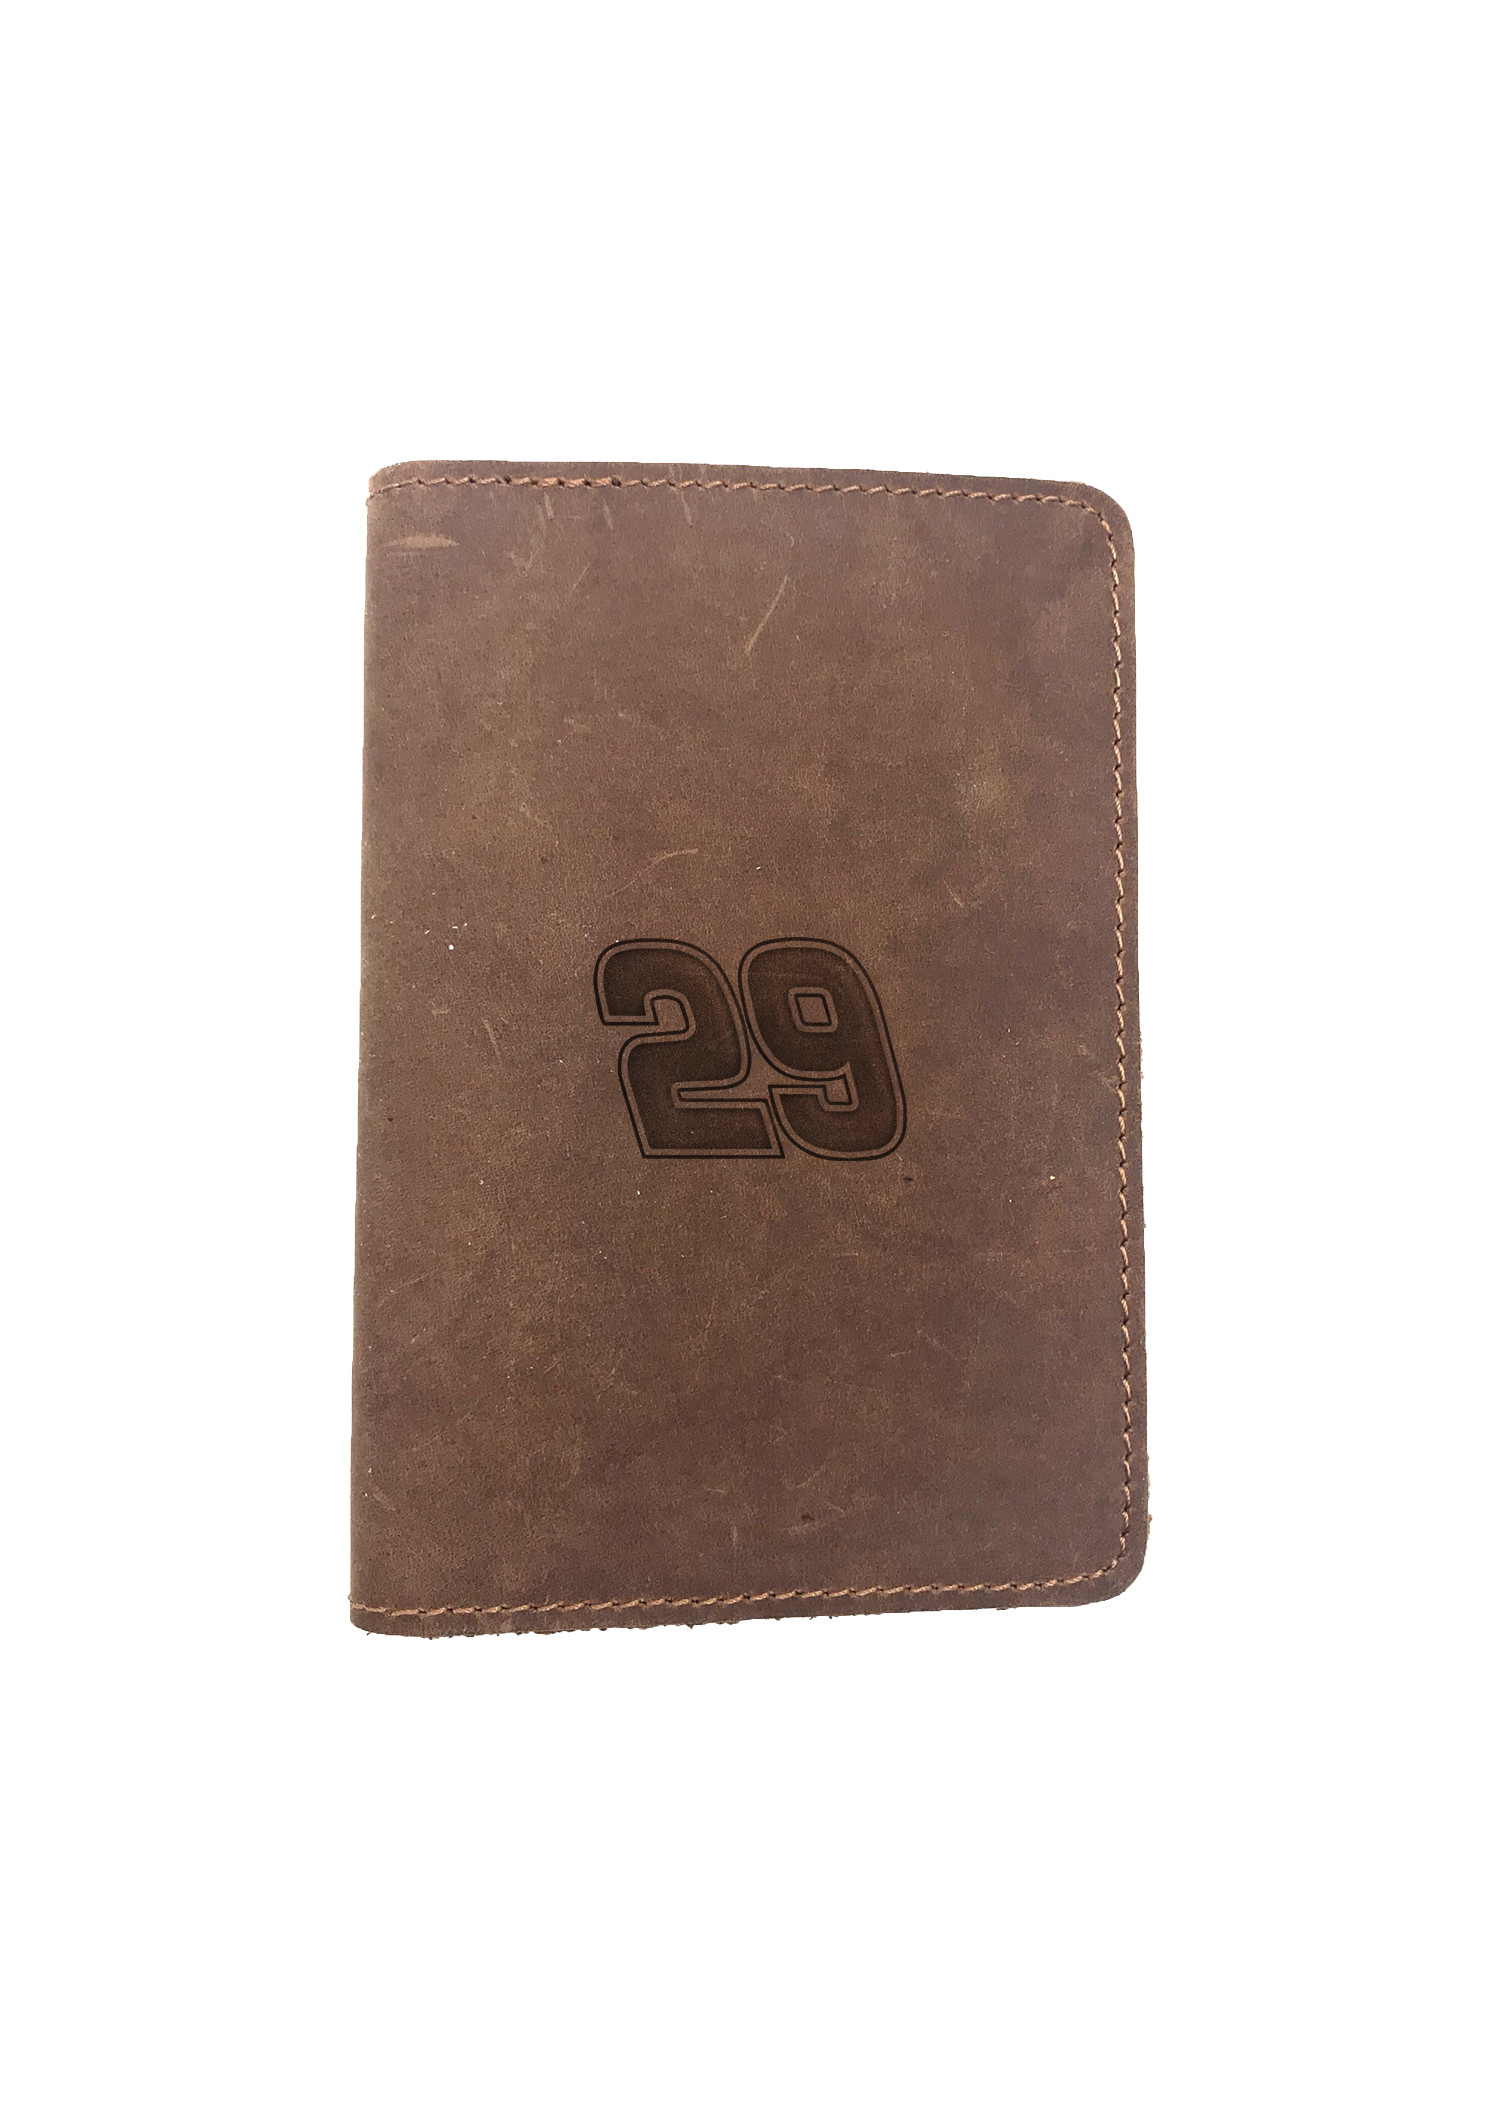 Passport Cover Bao Da Hộ Chiếu Da Sáp Khắc Hình Số NA 29 NASCAR 29 (BROWN)